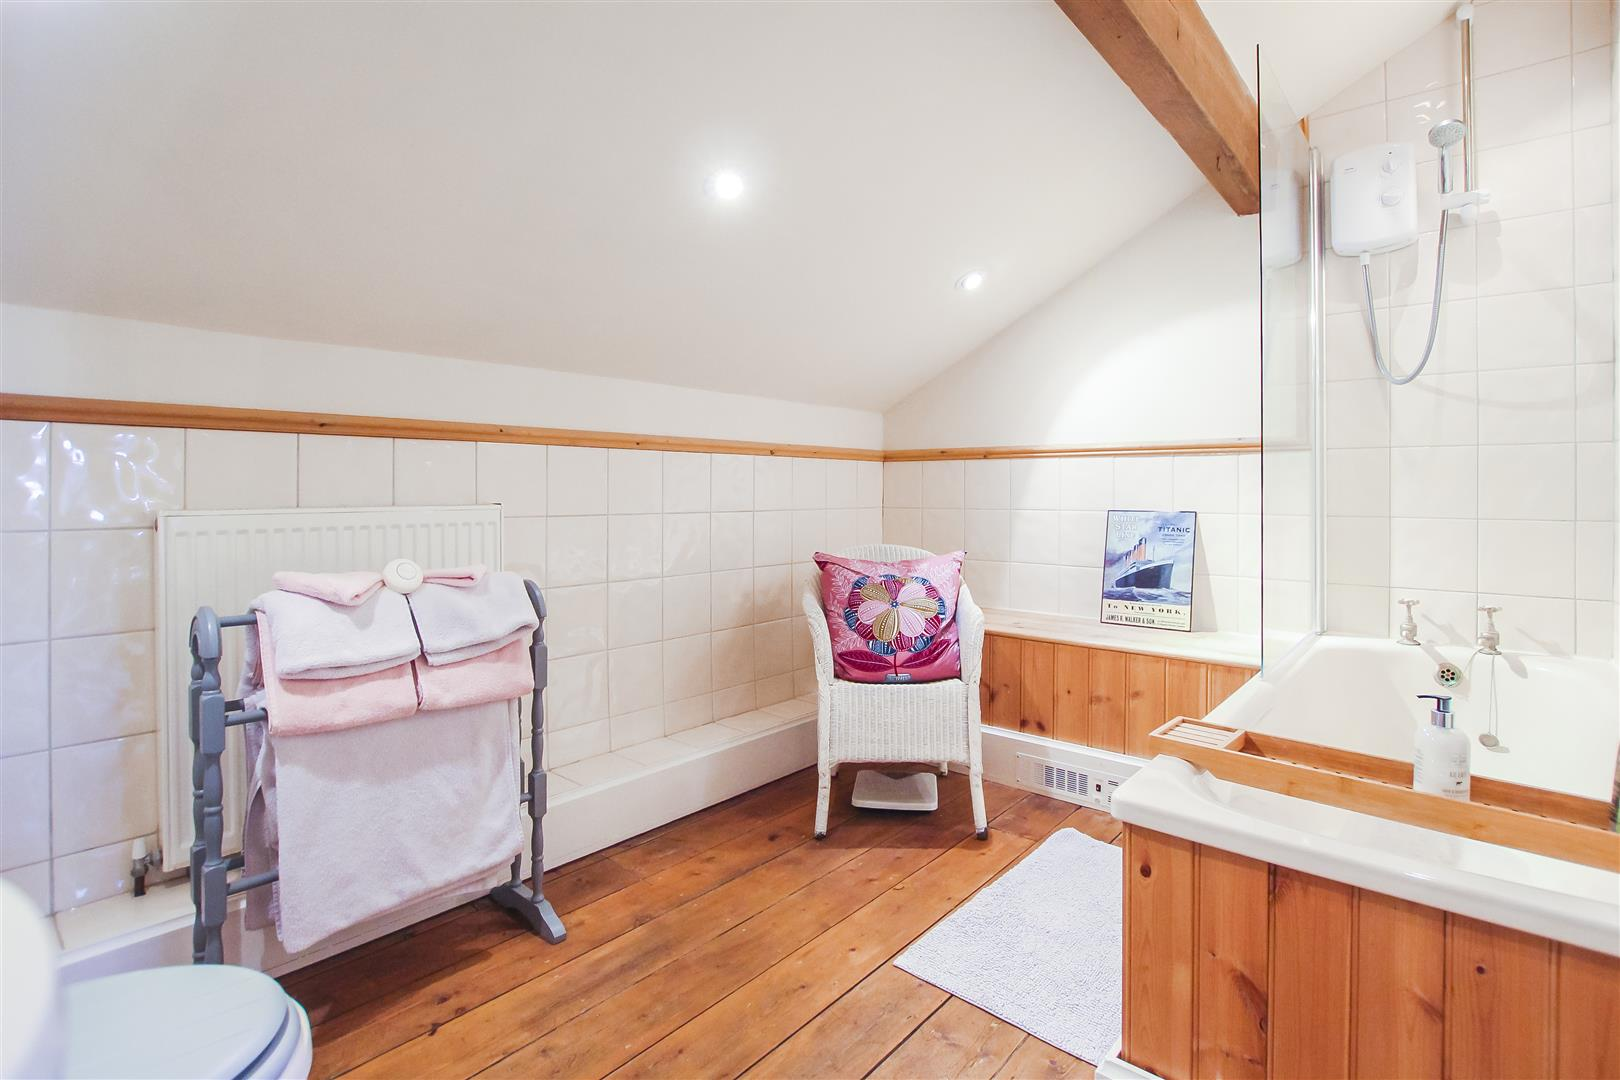 4 Bedroom House For Sale - En-suite